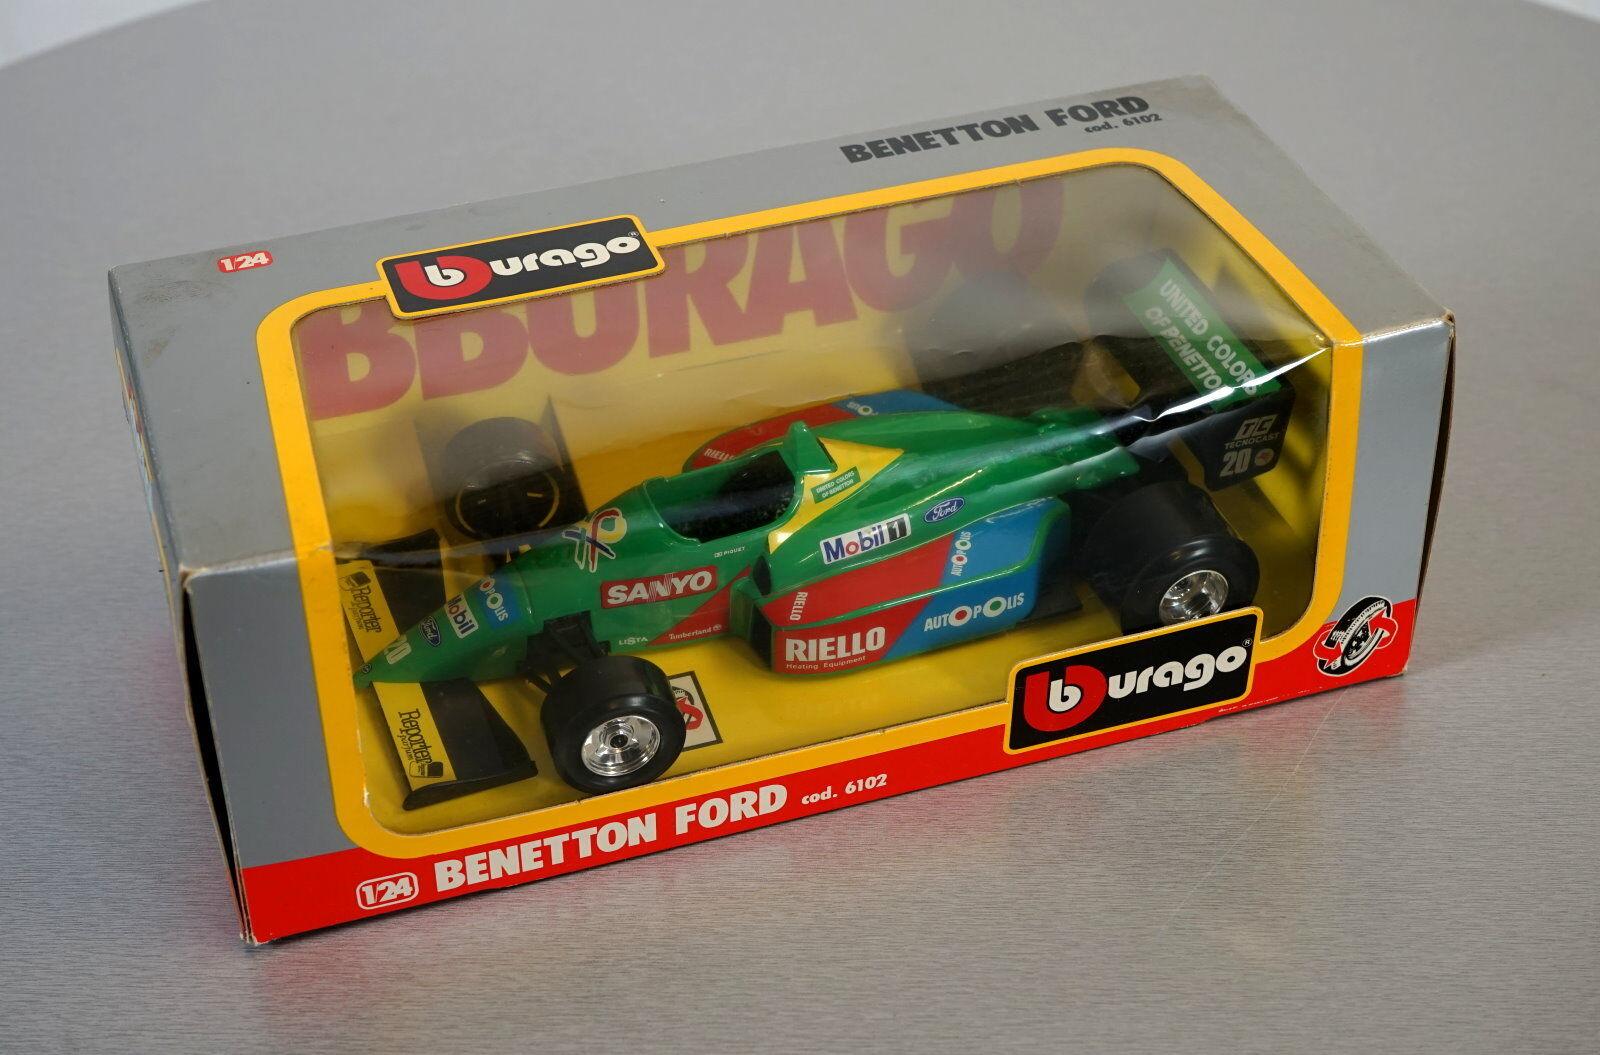 Burago 1 24 Benetton Ford - 6102 - - - Die-Cast Racing Car Scale Modell Auto NEU OVP  | Stilvoll und lustig  7e02aa